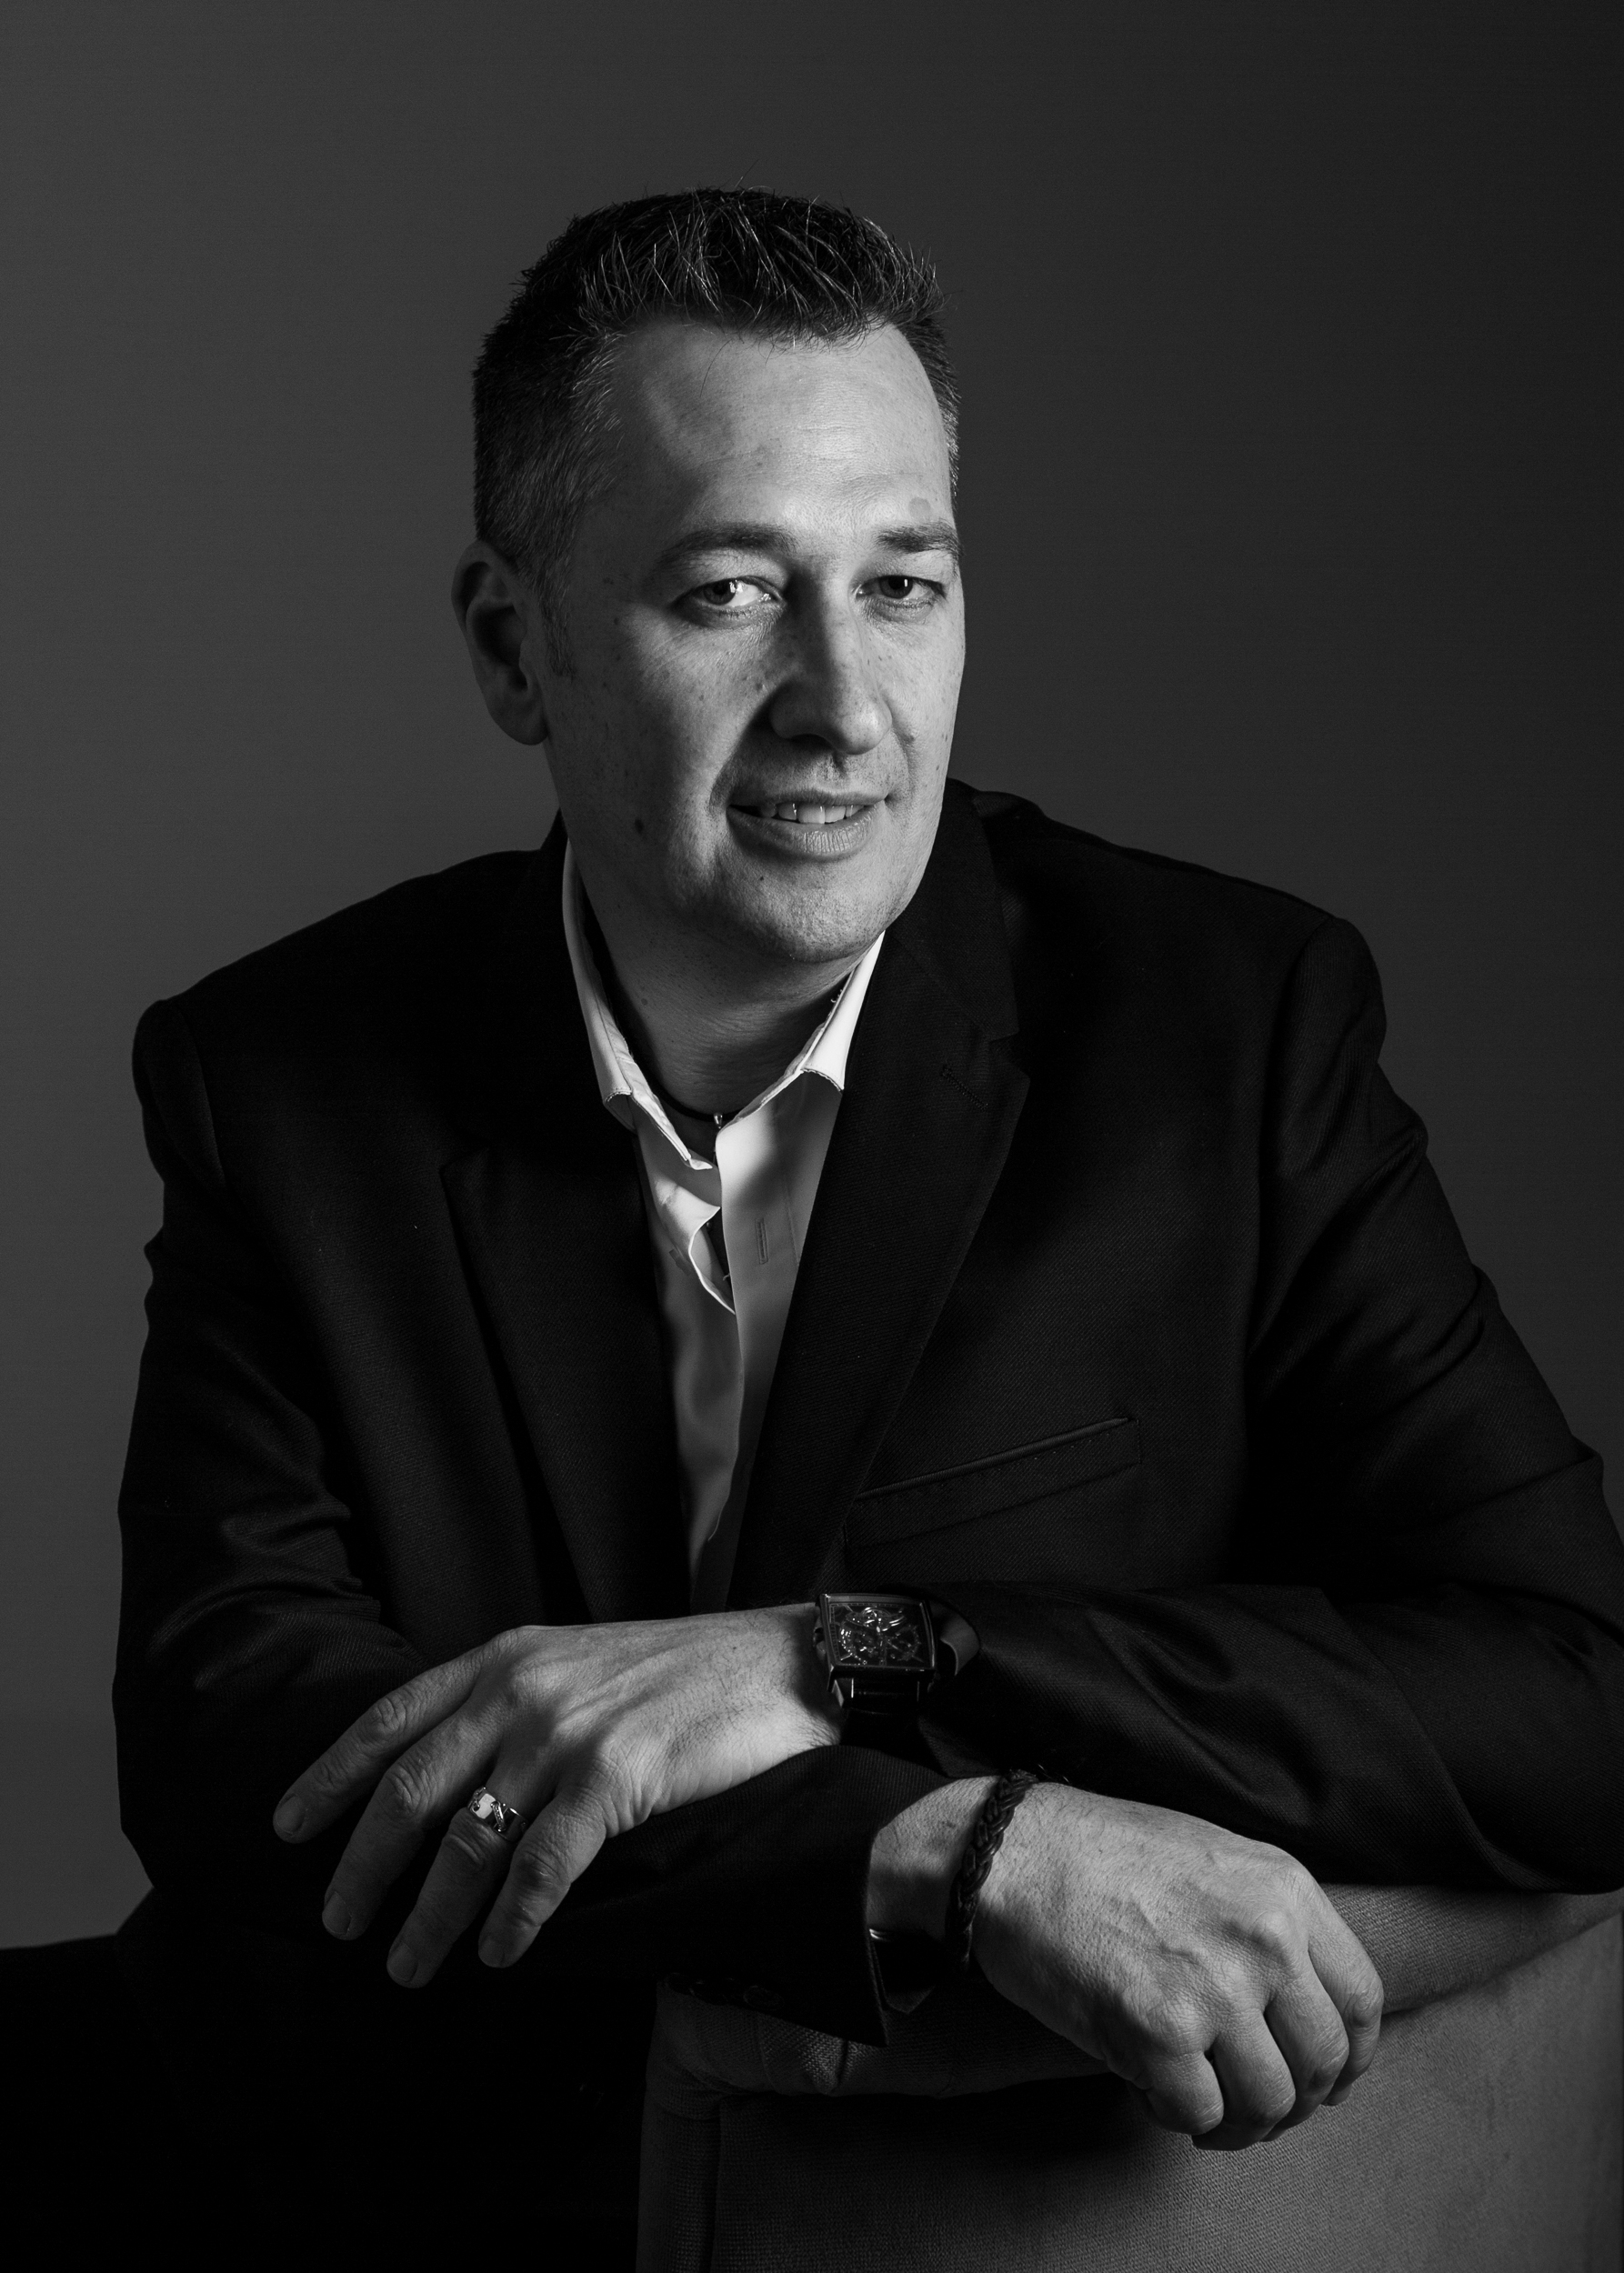 Christophe Mariusse